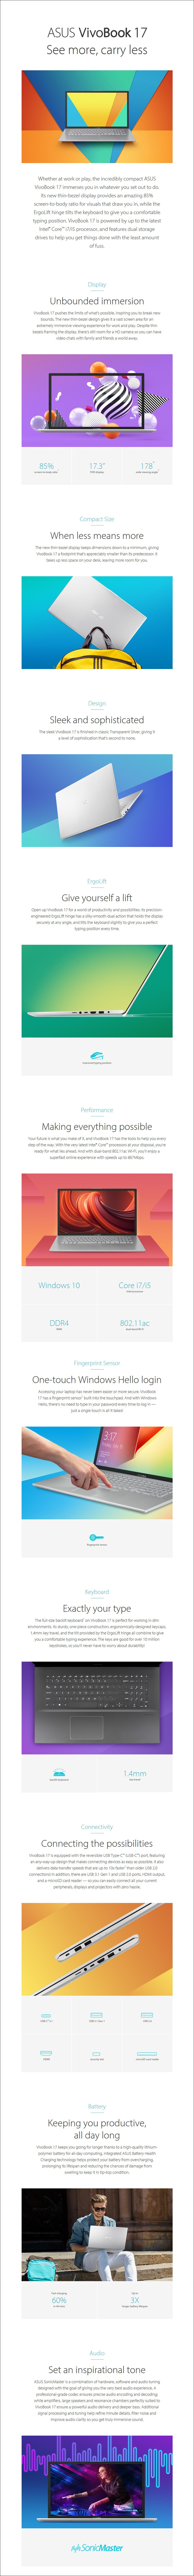 "ASUS VivoBook 17 X712FA 17"" Laptop i5-8265U 8GB 512GB W10P - Silver - Overview 1"